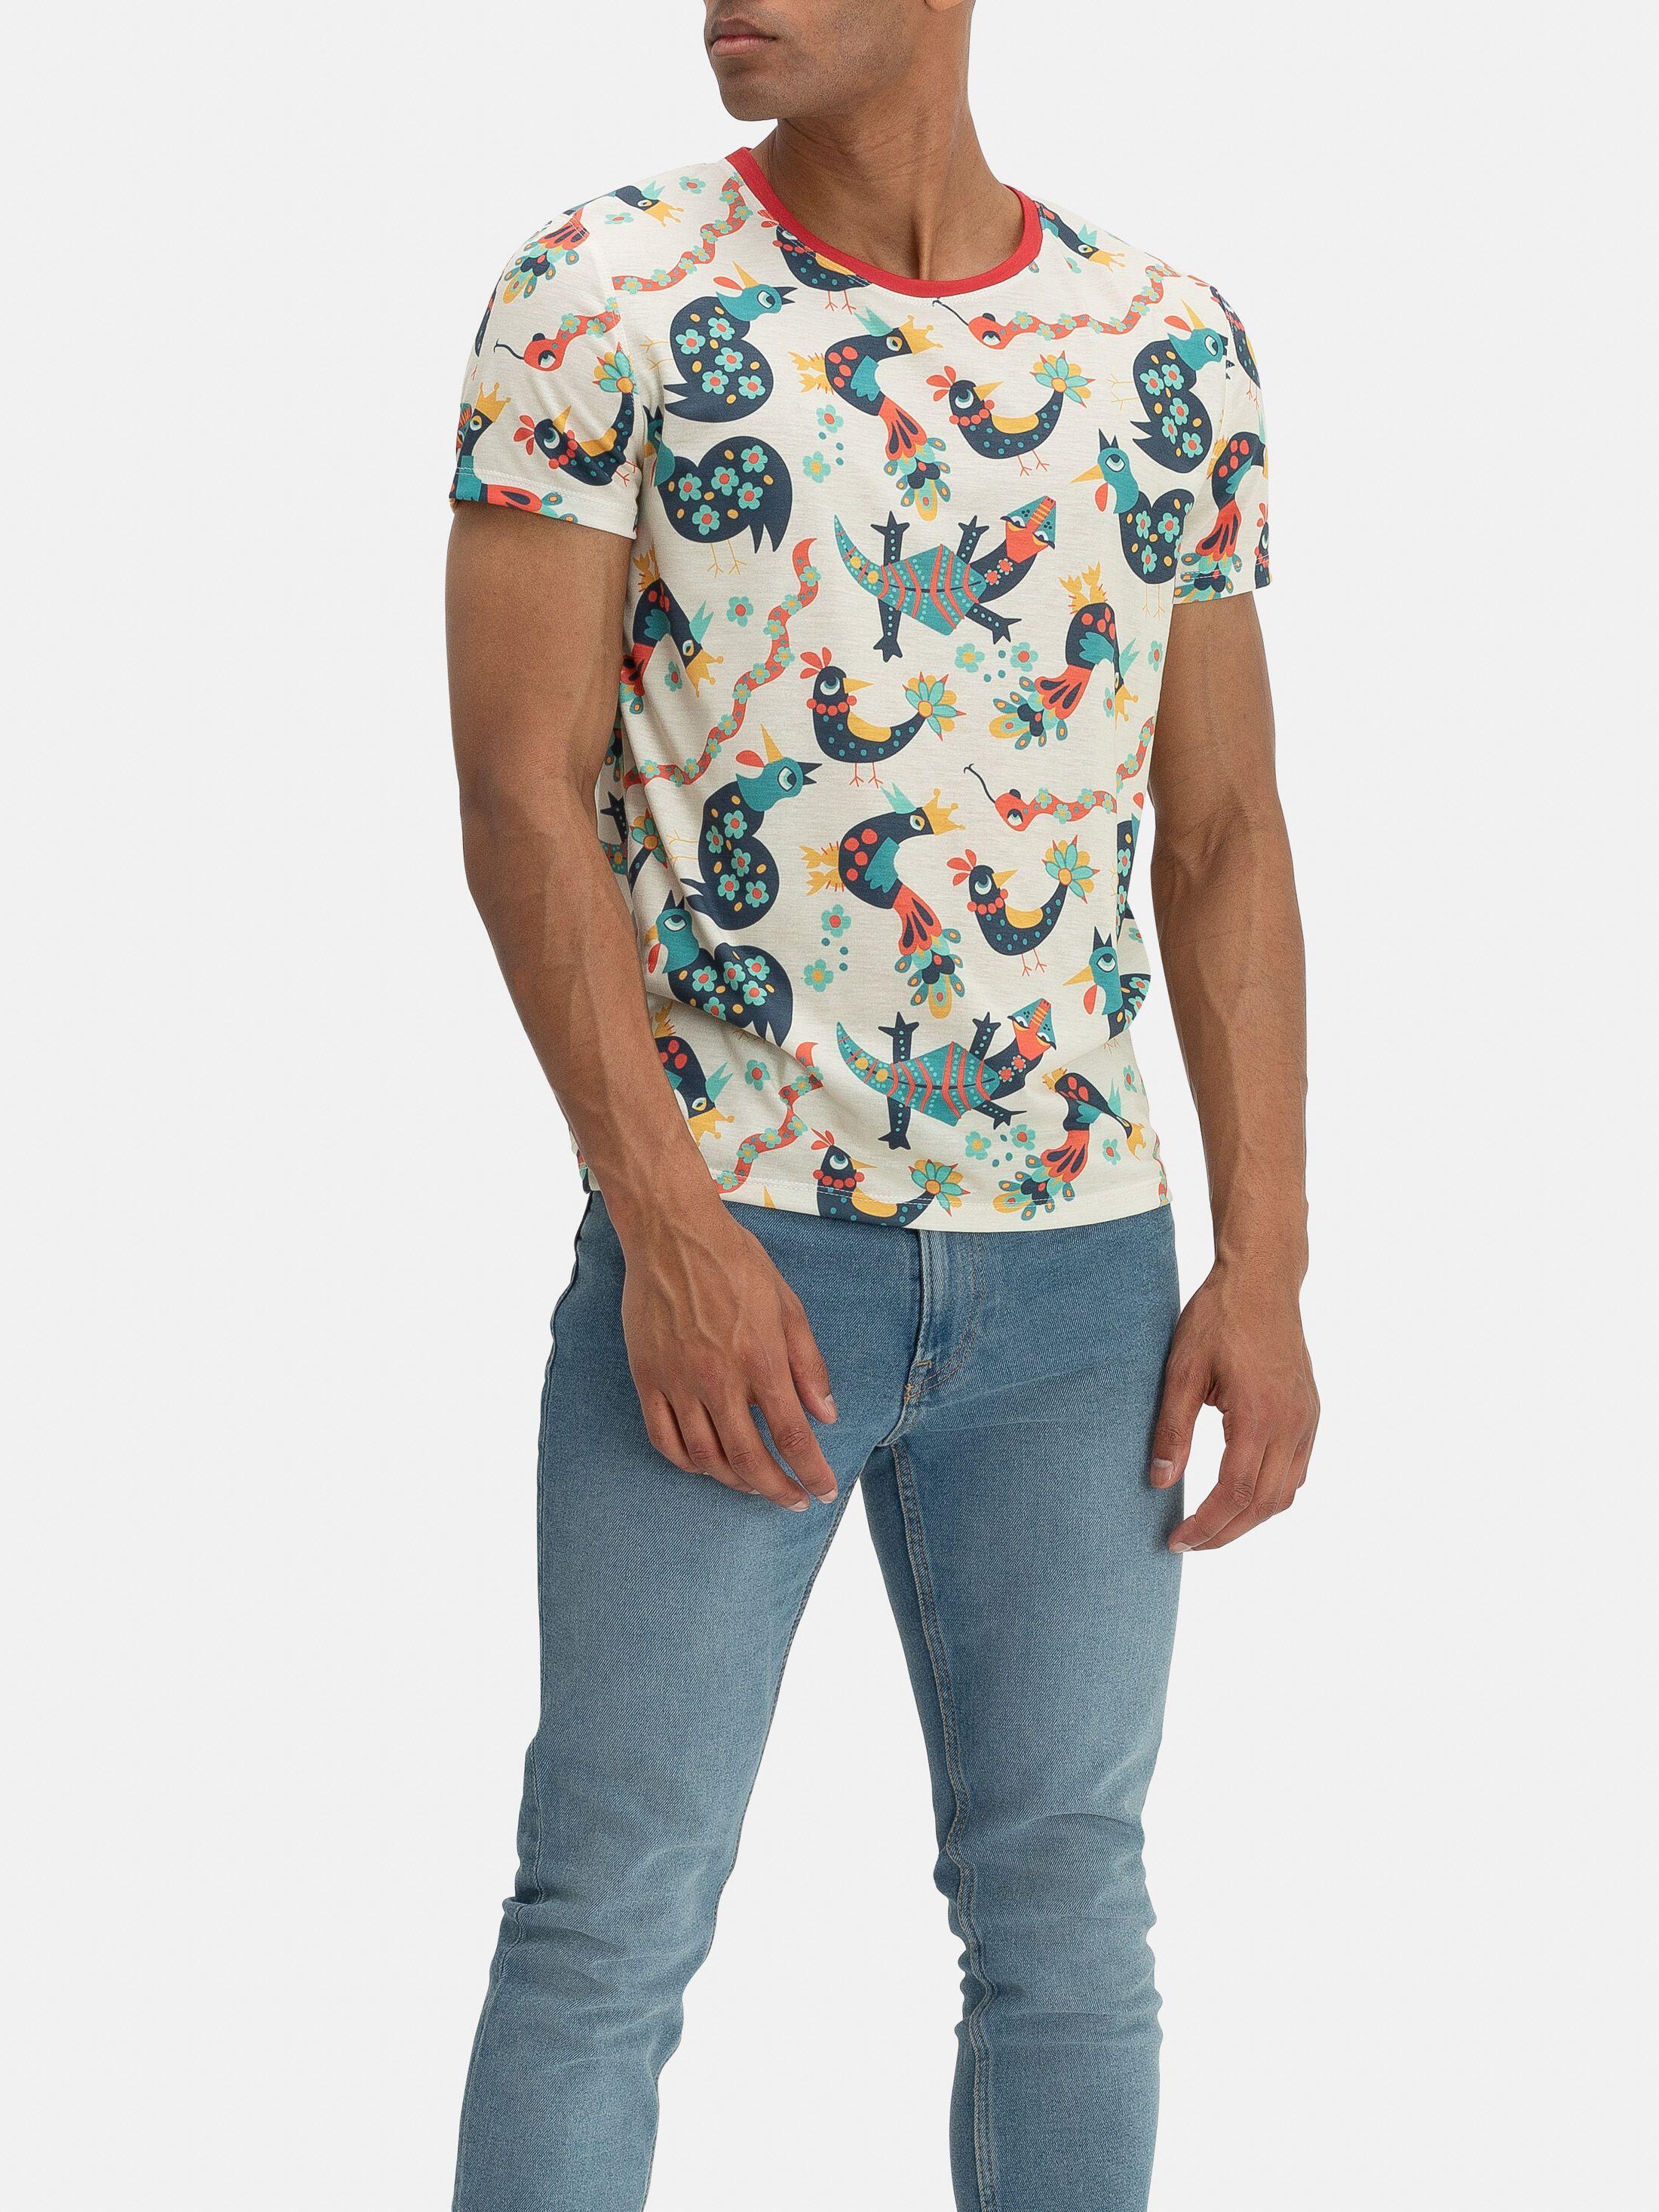 handmade custom t shirt